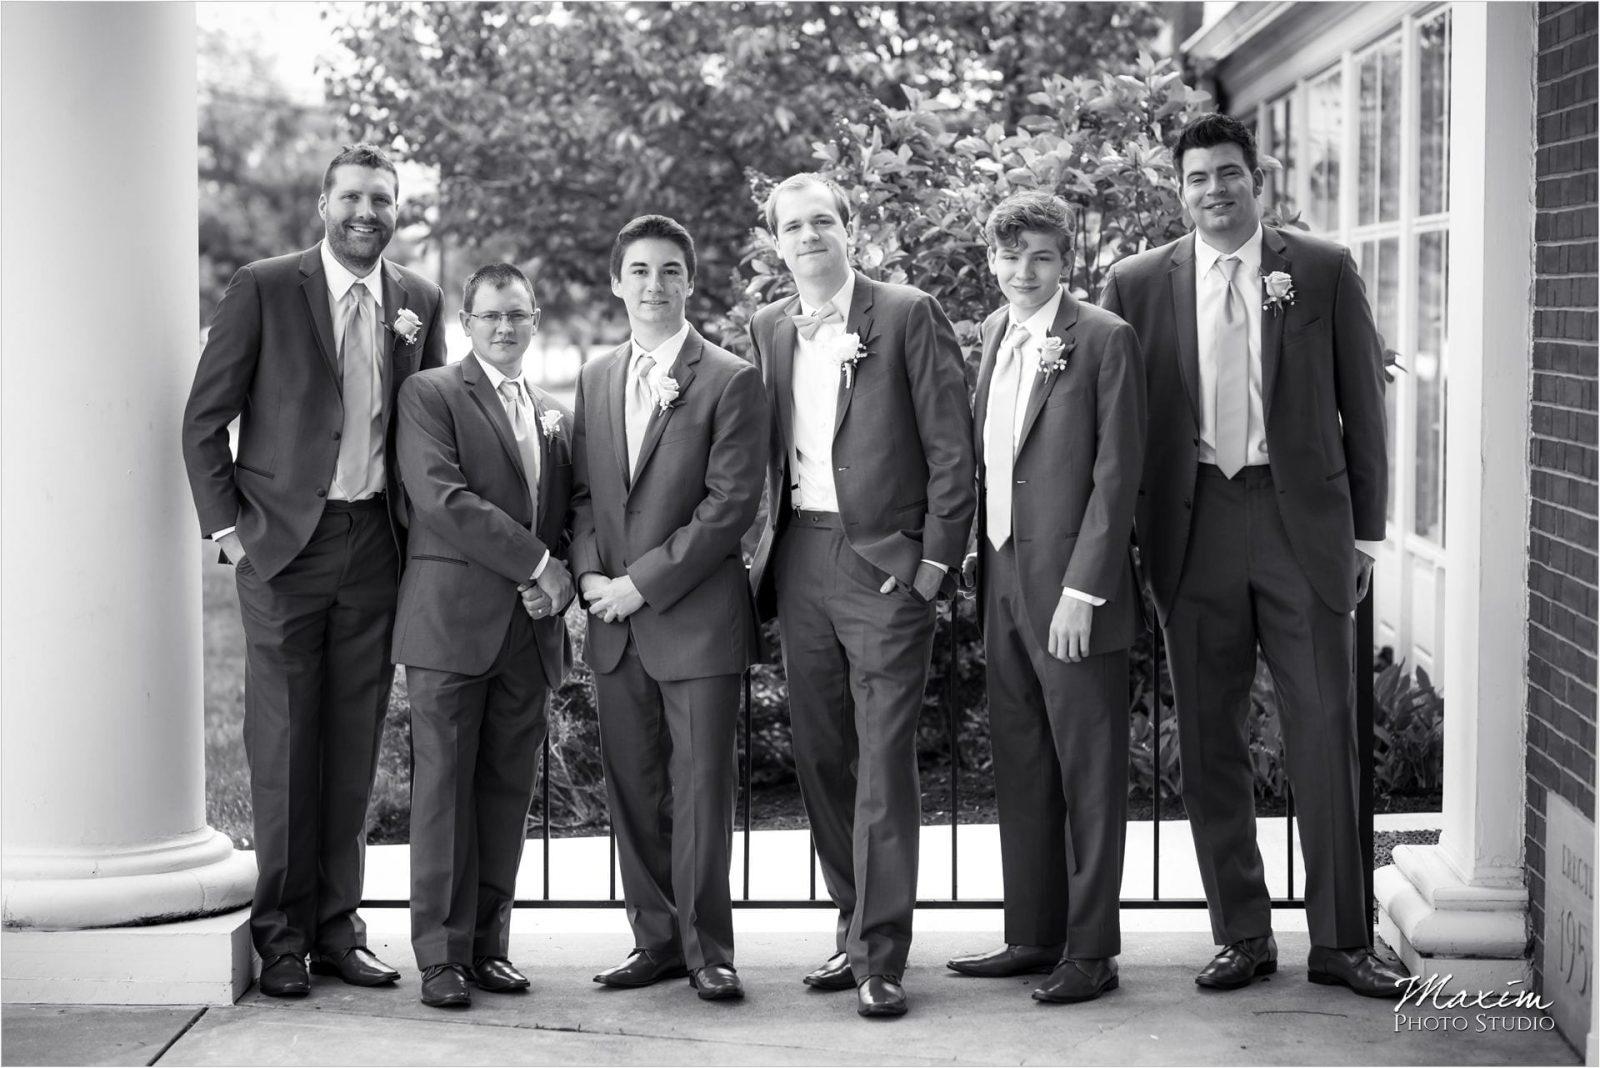 Anderson Hills UMC Cincinnati Wedding, Groom, groomsmen